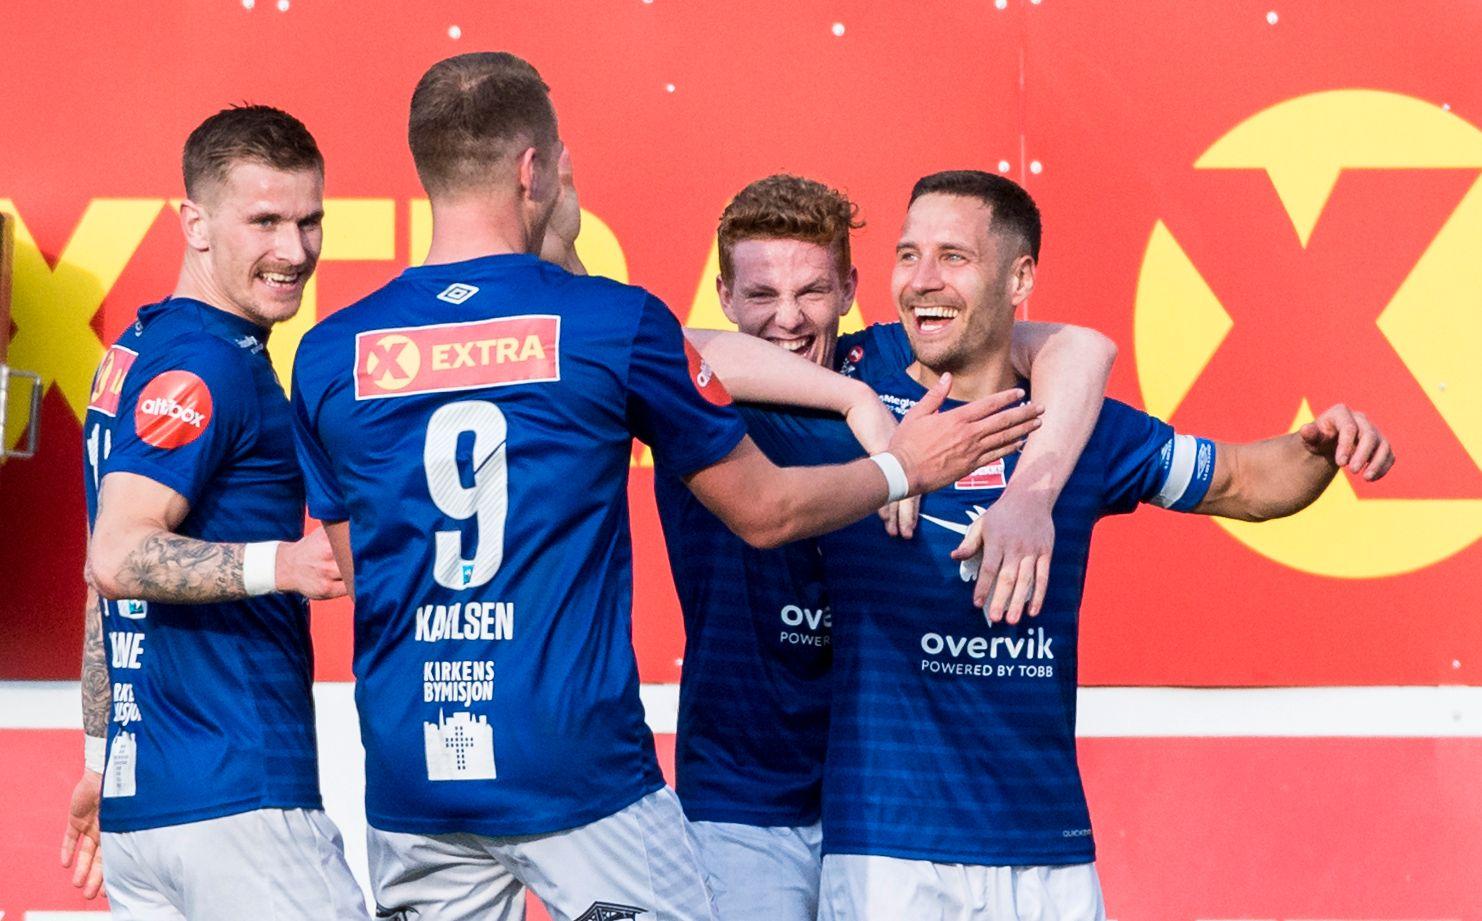 X-FAKTOR: Ranheims Mads Reginiussen (t.h.) blir gratulert med scoringen mot Odd i en seriekamp tidligere denne måneden.